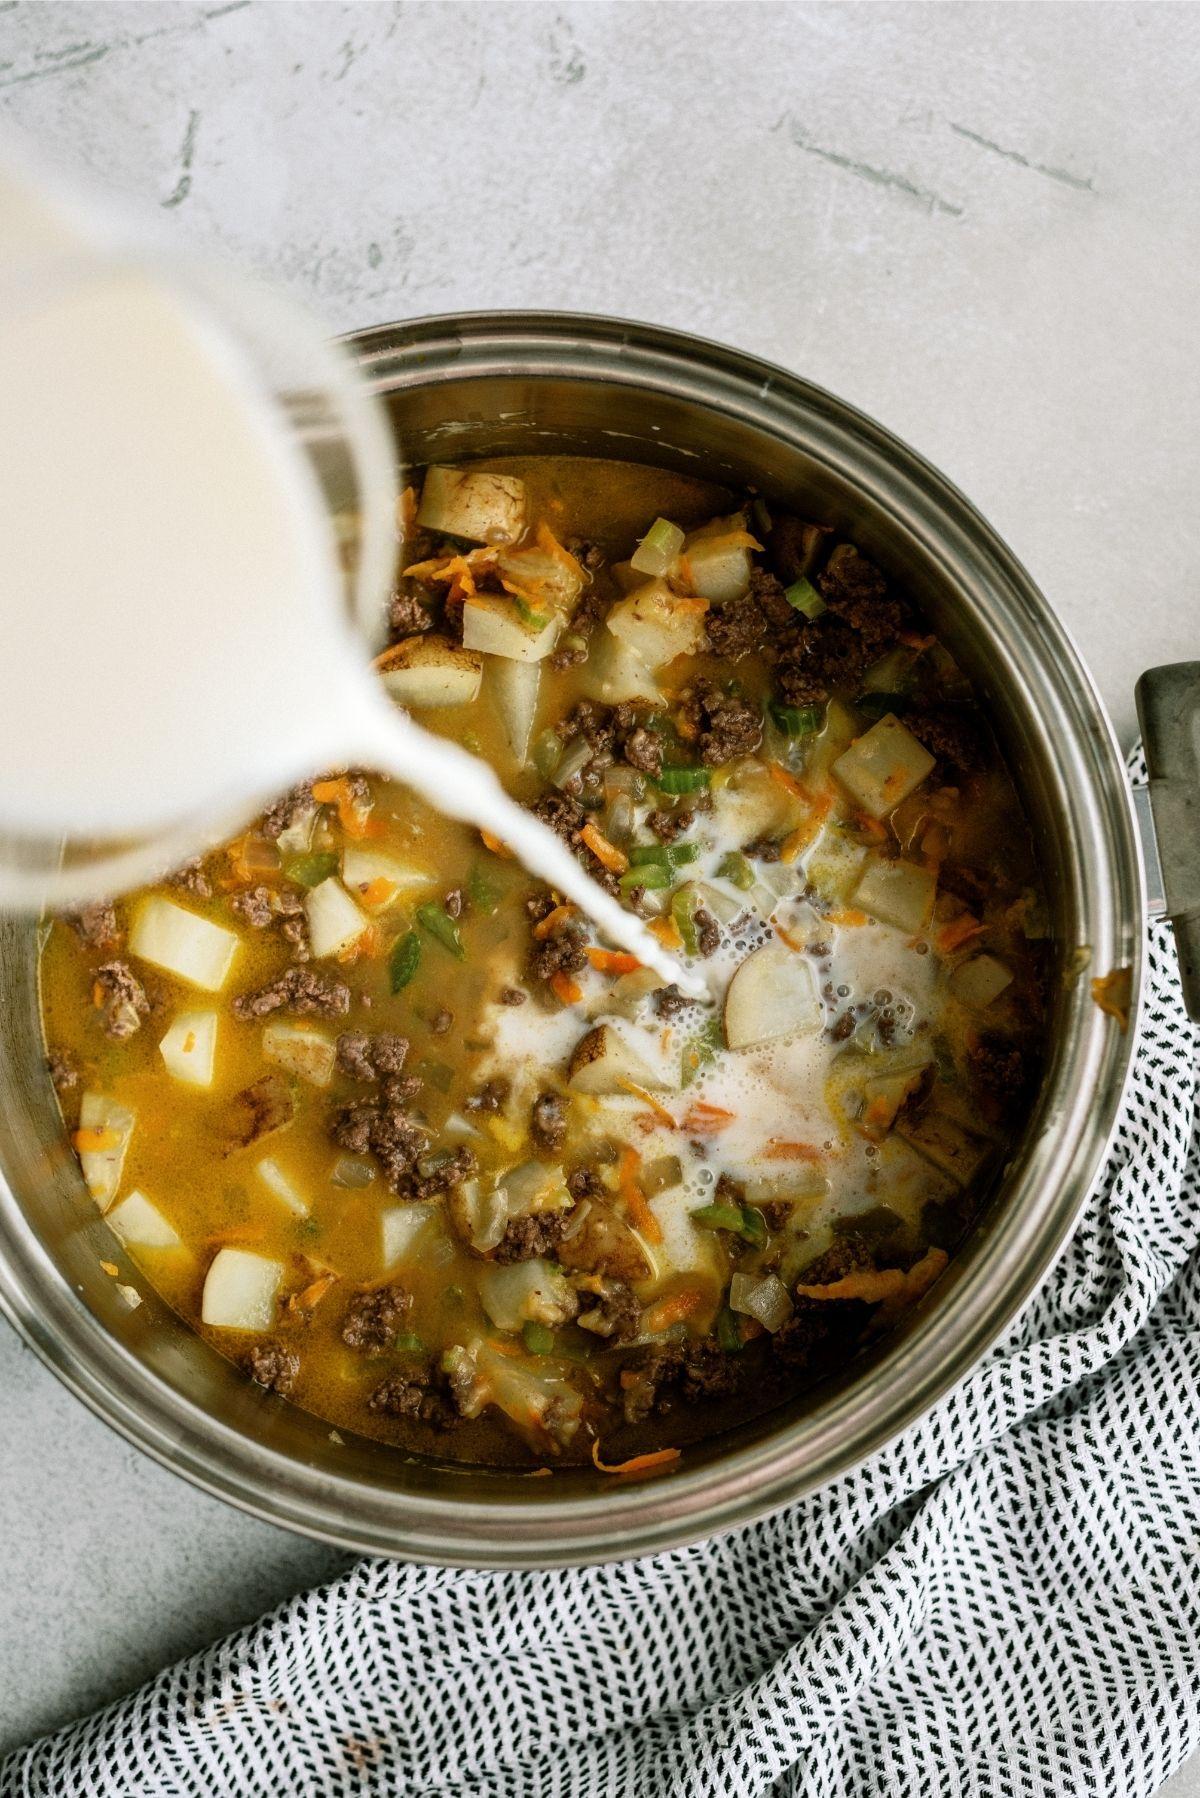 Adding milk to Cheeseburger Soup mixture in saucepan